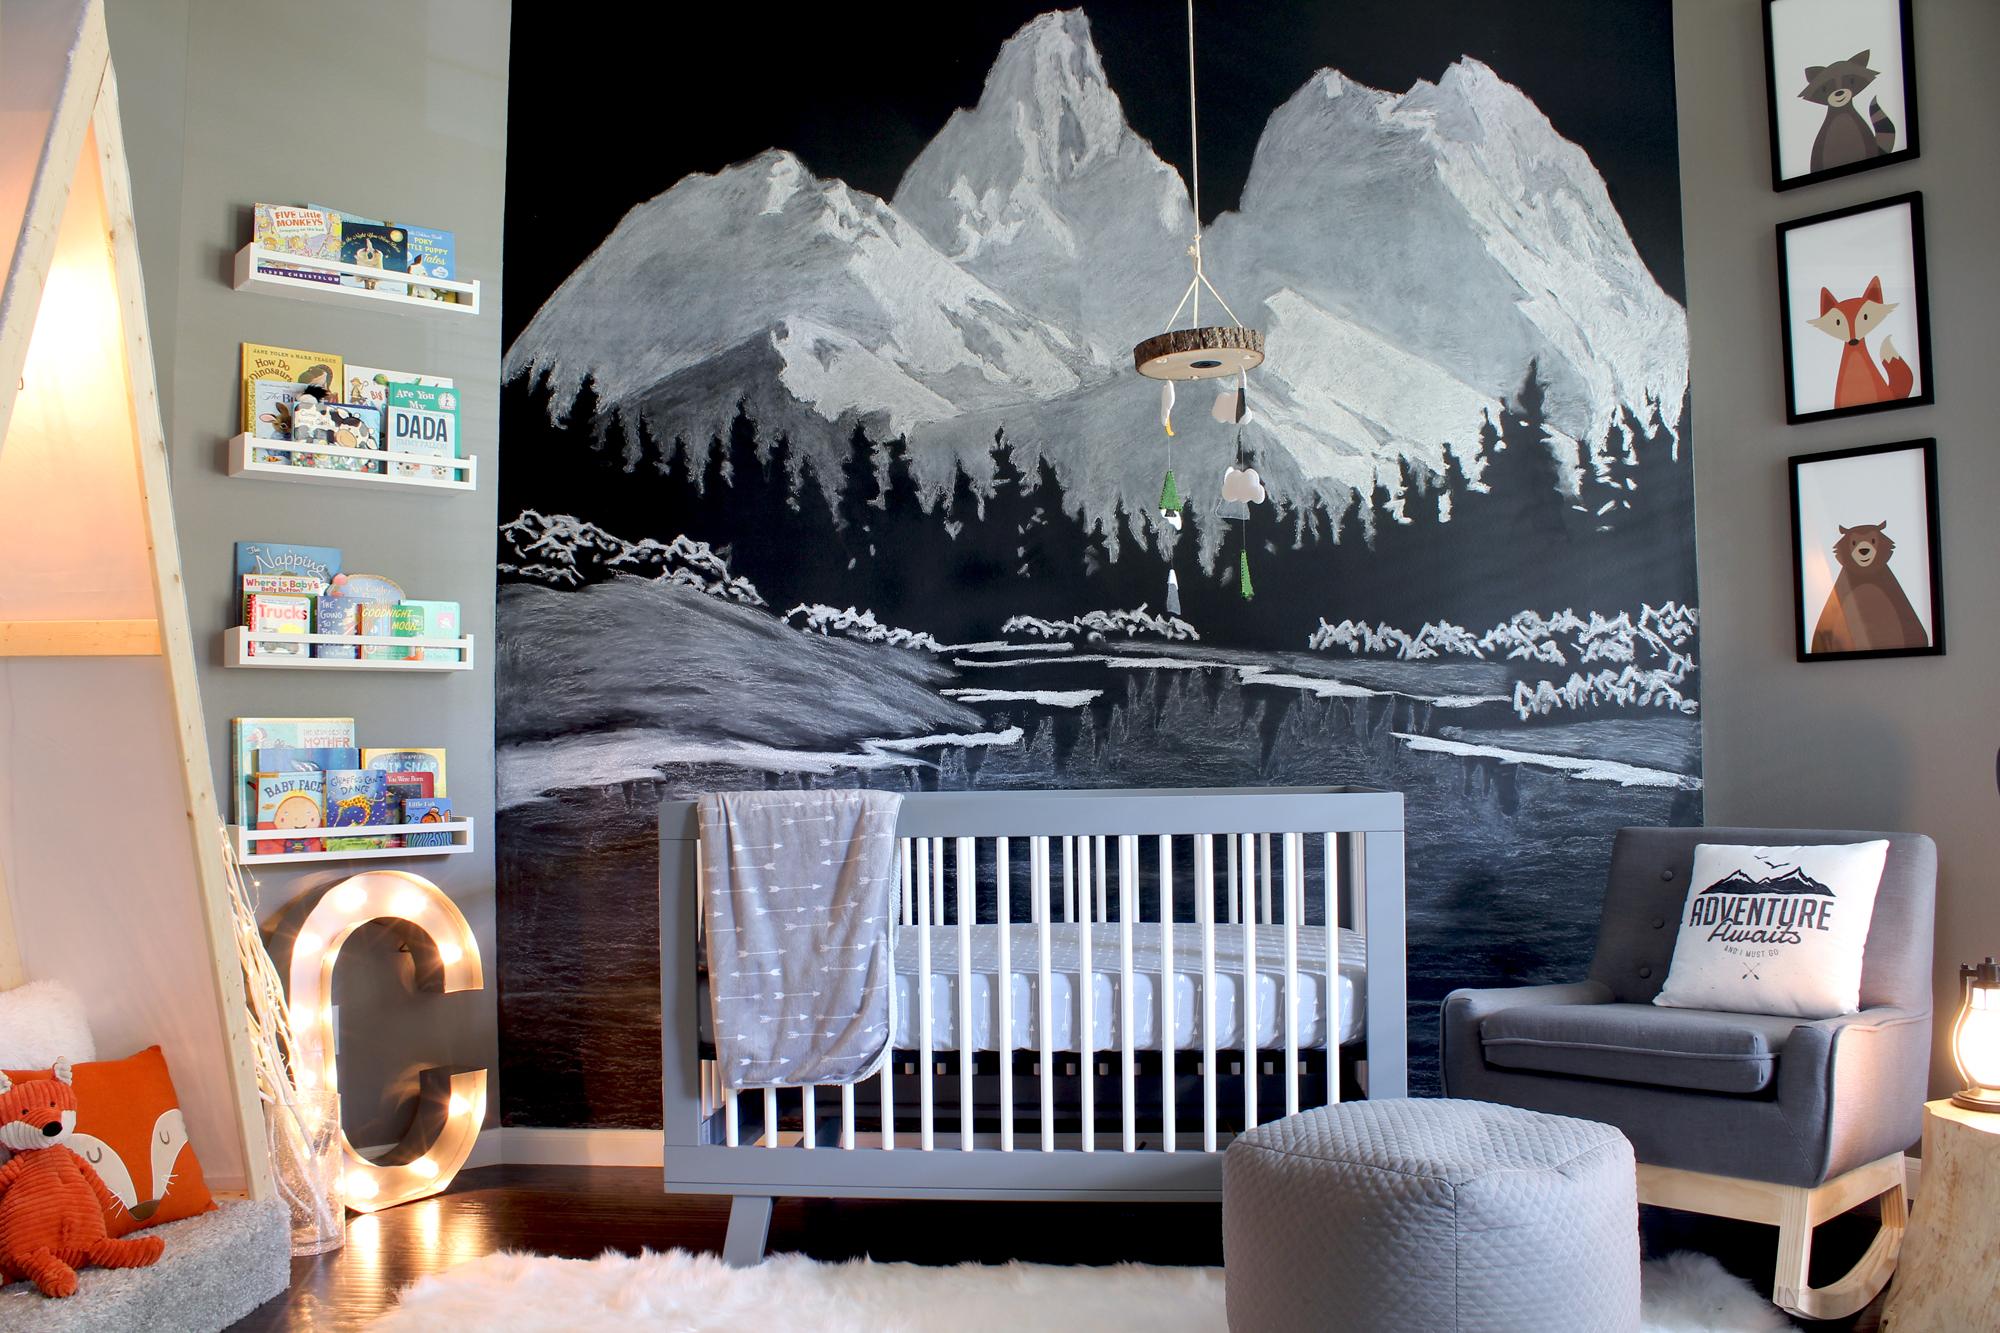 Chalkboard Paint Like You Ve Never Seen It Before A Magical Chalk Art Mountain Mural